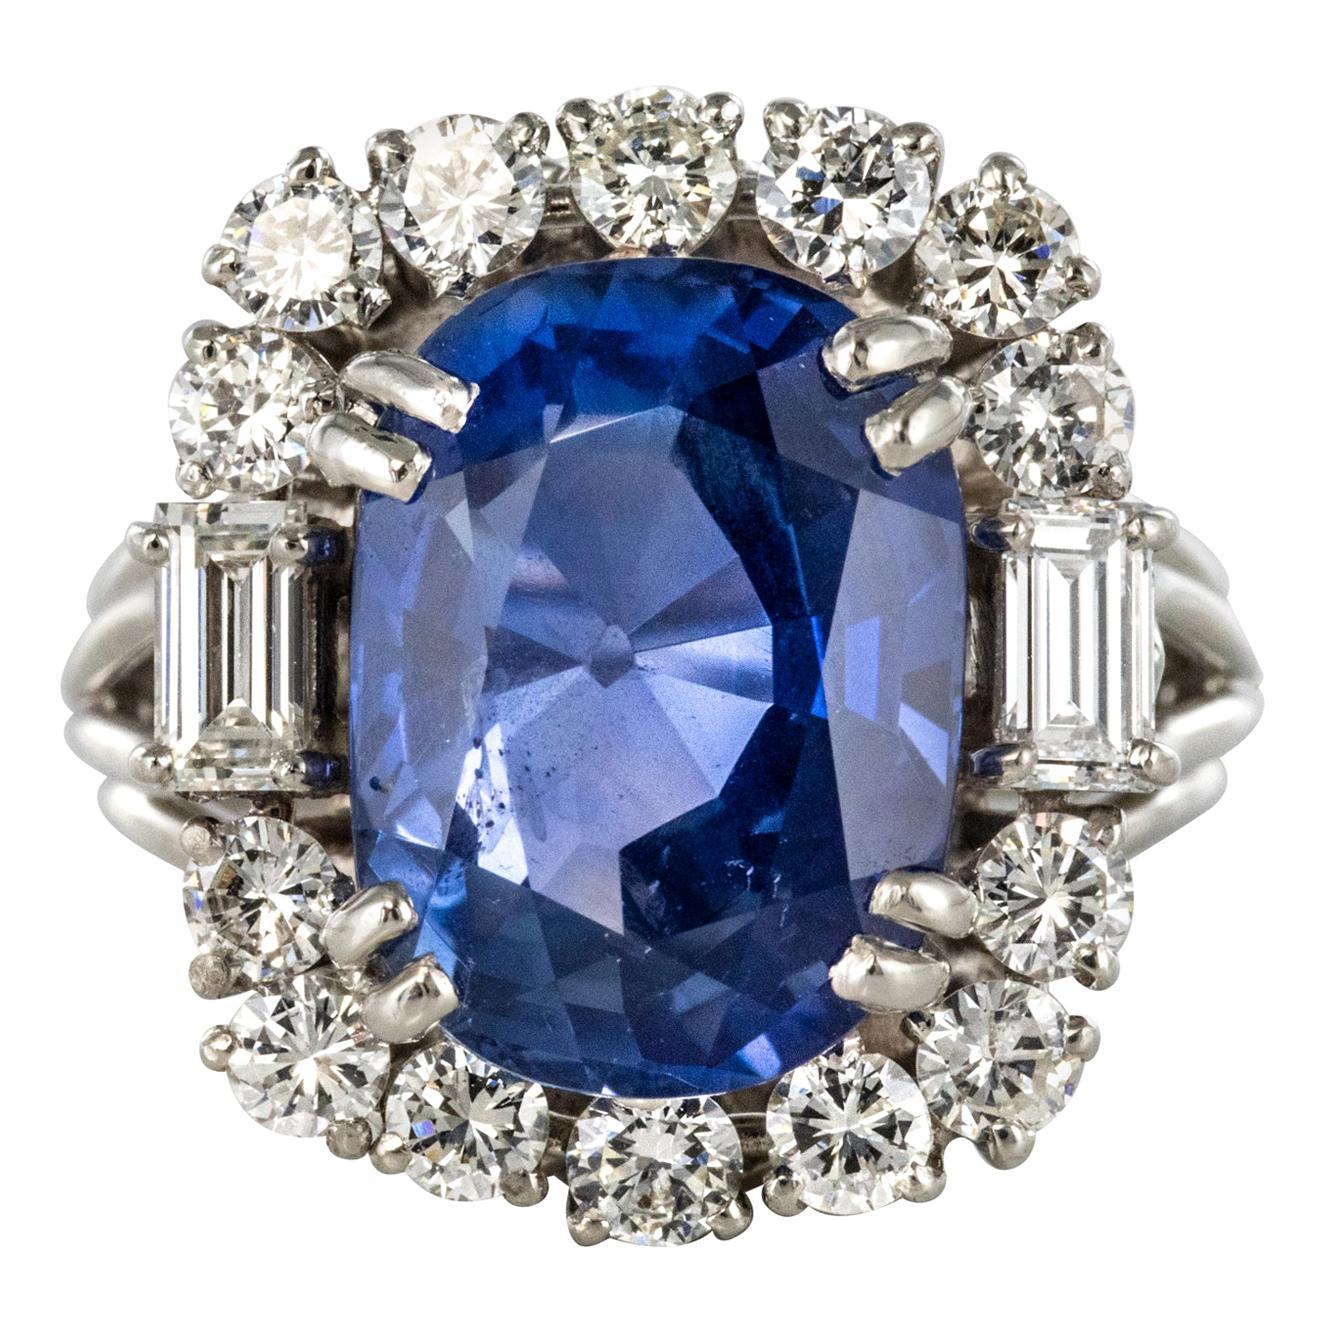 French 1950s No Heat Ceylon Cushion Cut Sapphire Diamonds Platinum Cocktail Ring